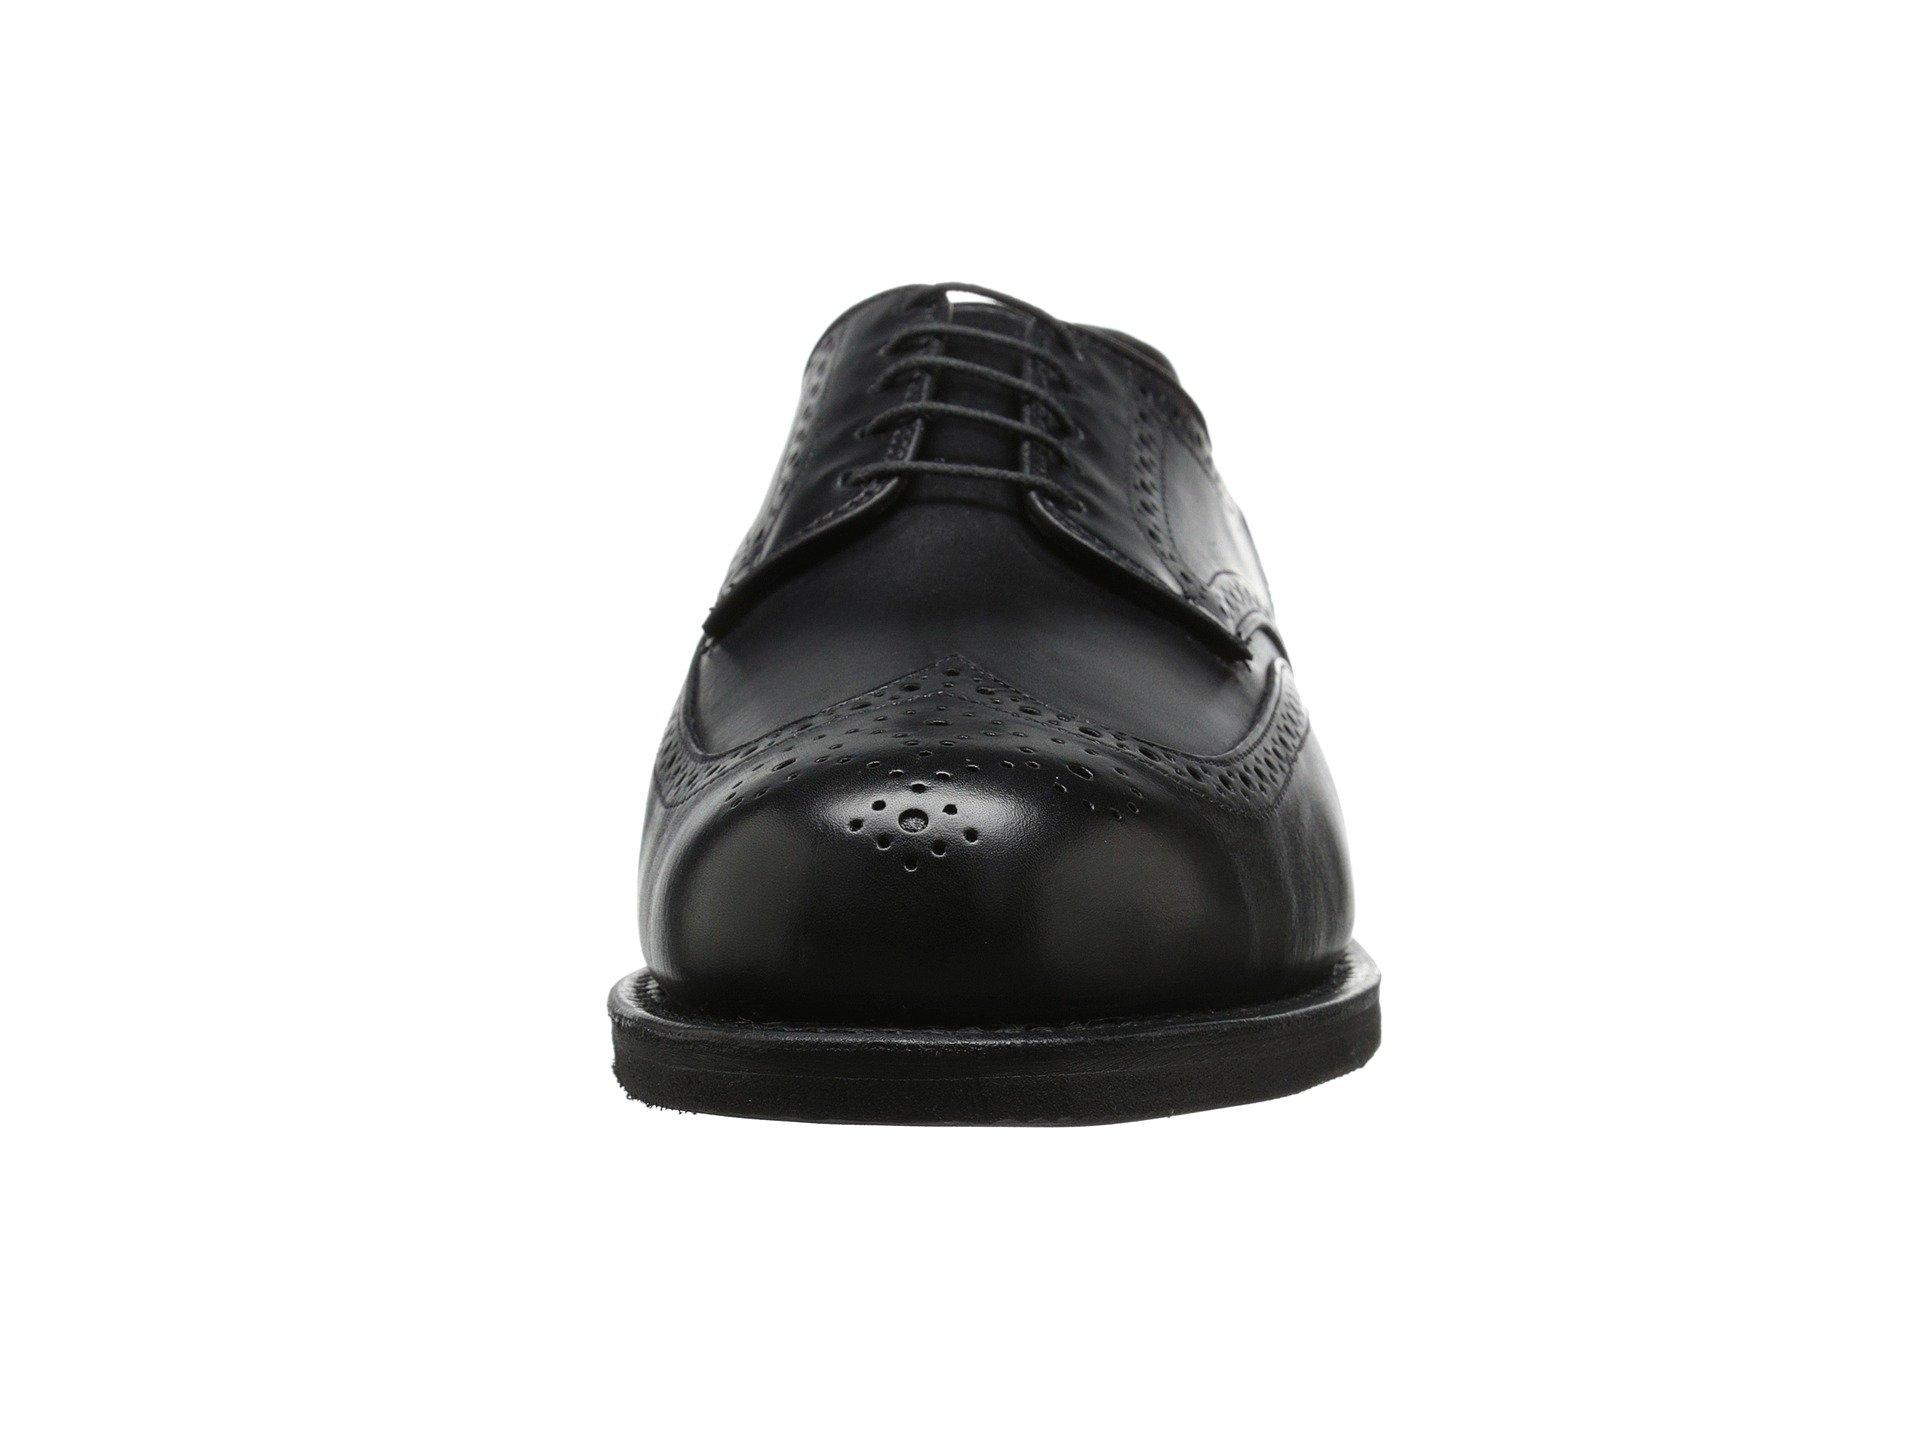 Leather Allen Allen Lga Lga Edmonds Leather Allen Black Lga Black Lga Allen Leather Edmonds Black Edmonds Edmonds TTrxC8Aw